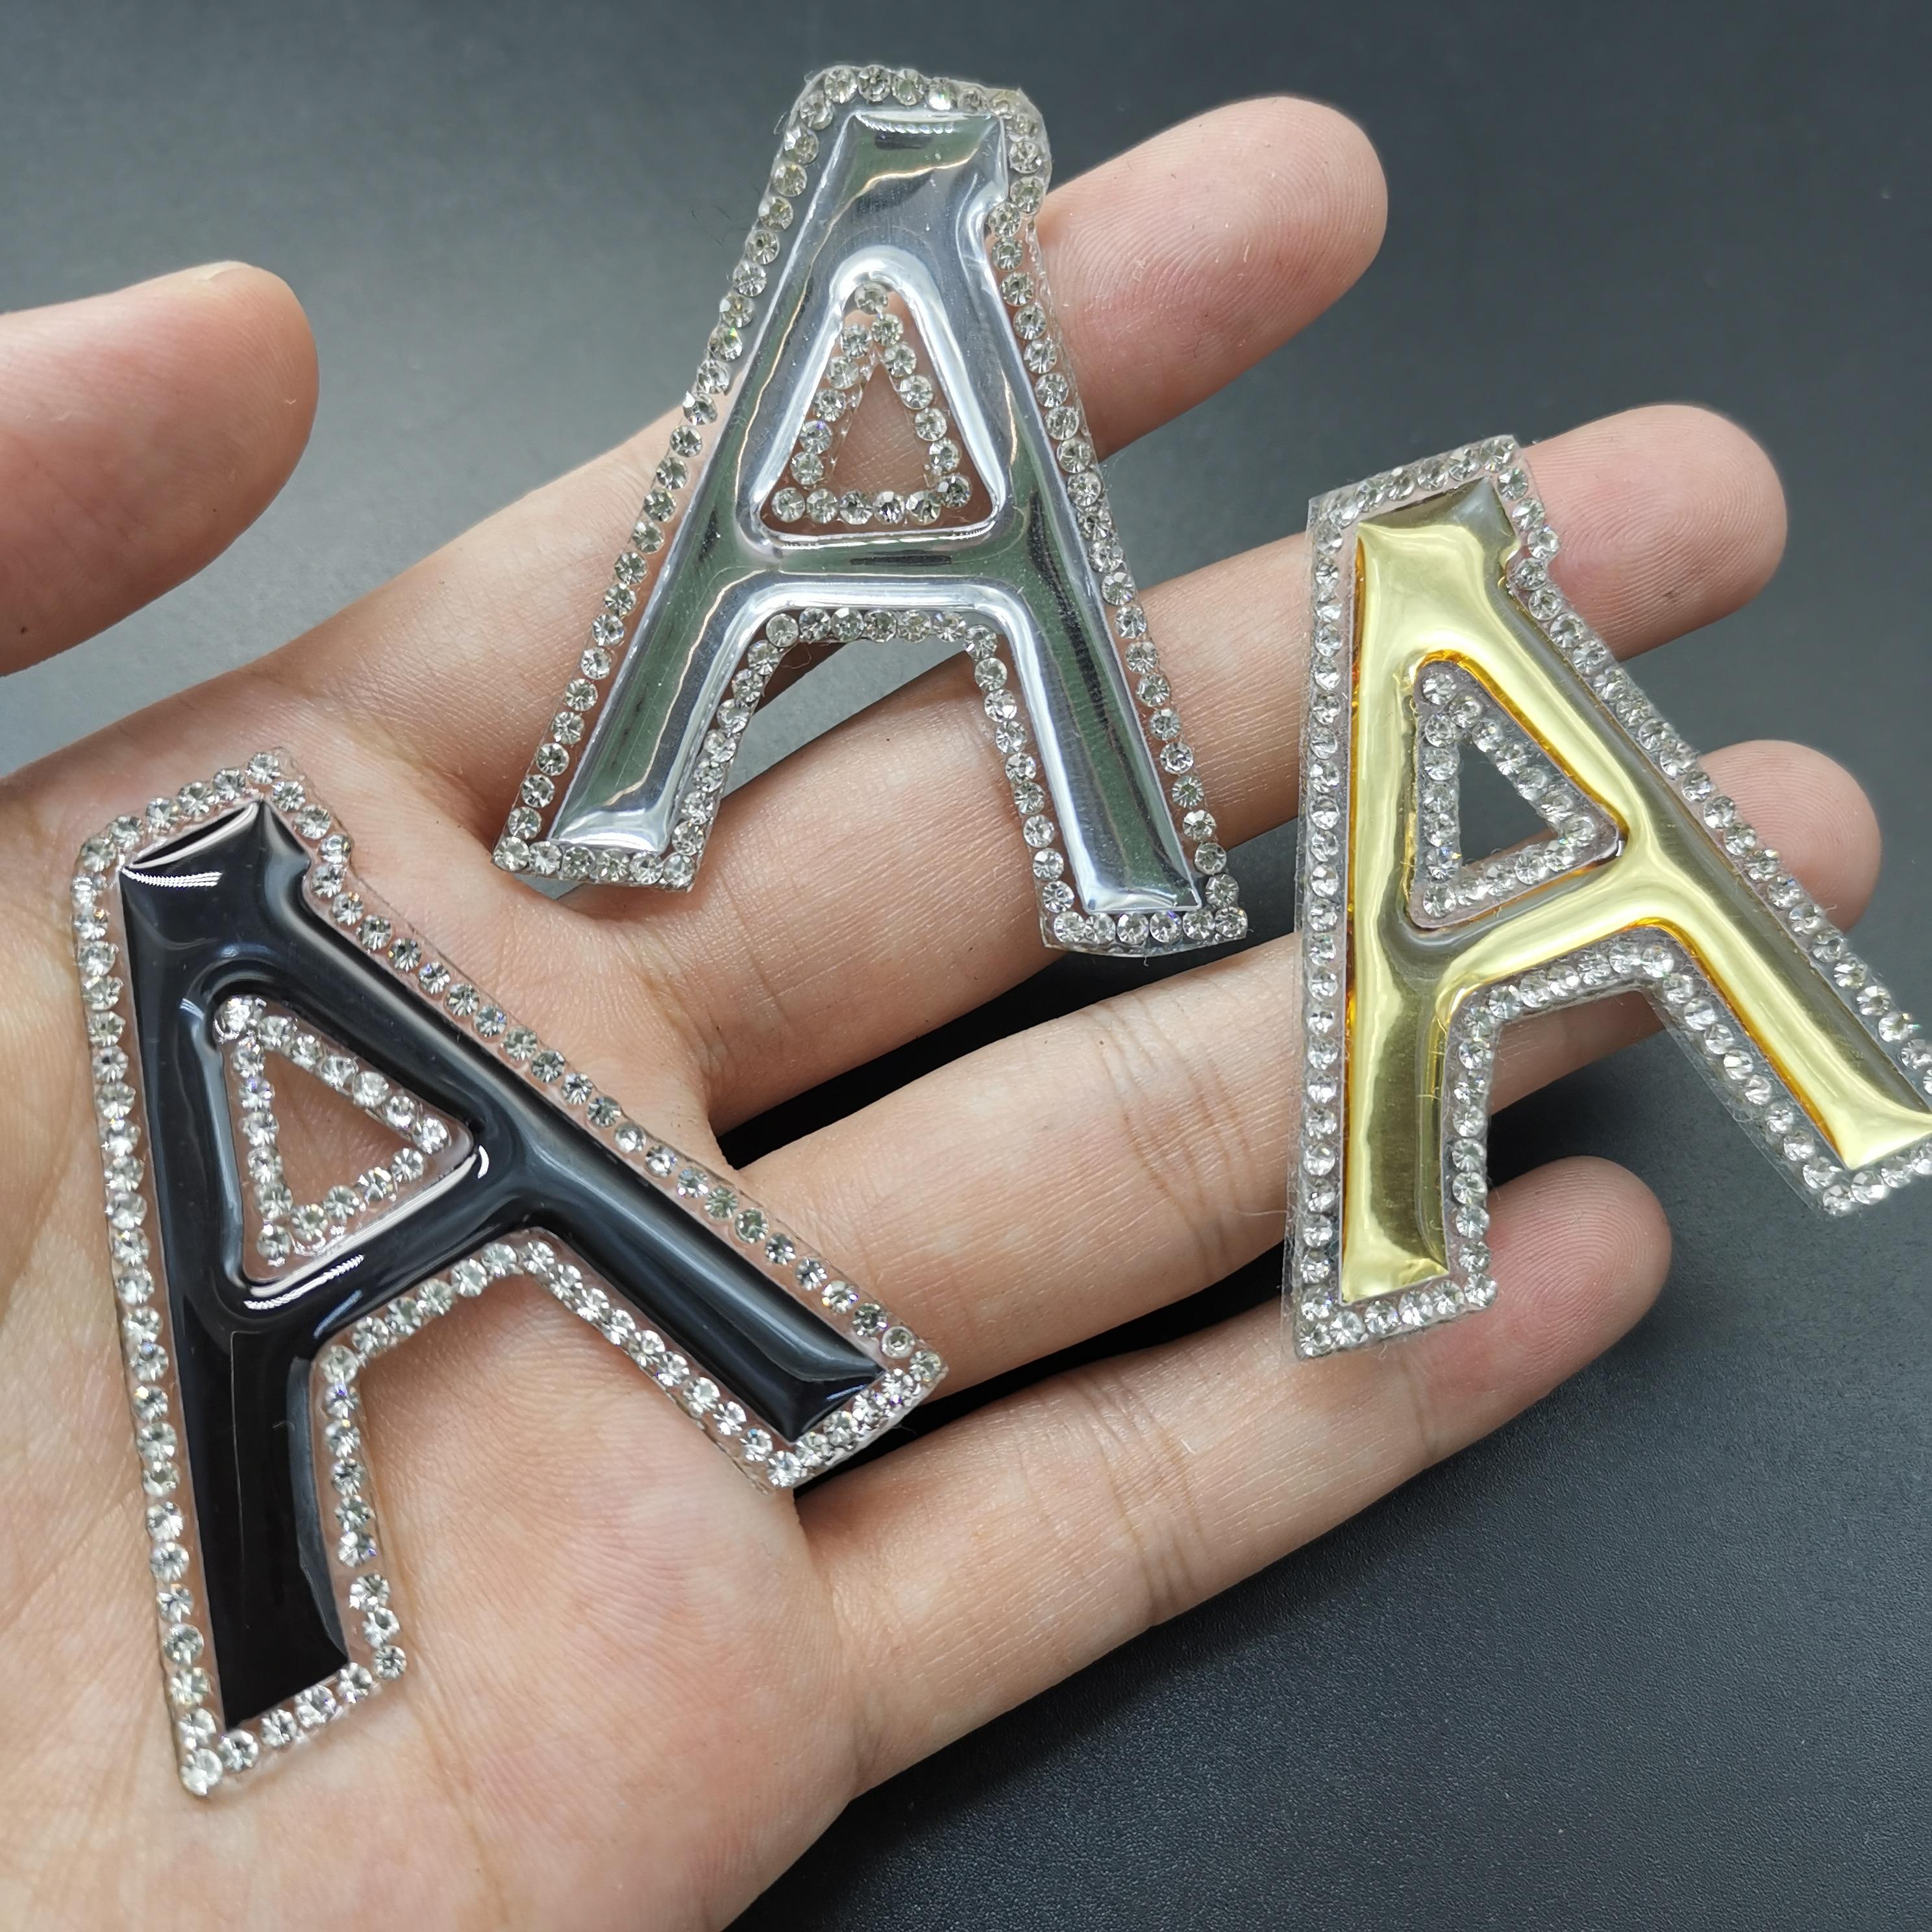 A-Z preto prata ouro ferro em letras 3d remendos carta remendo thermocollant despeje remendos de roupas vetement